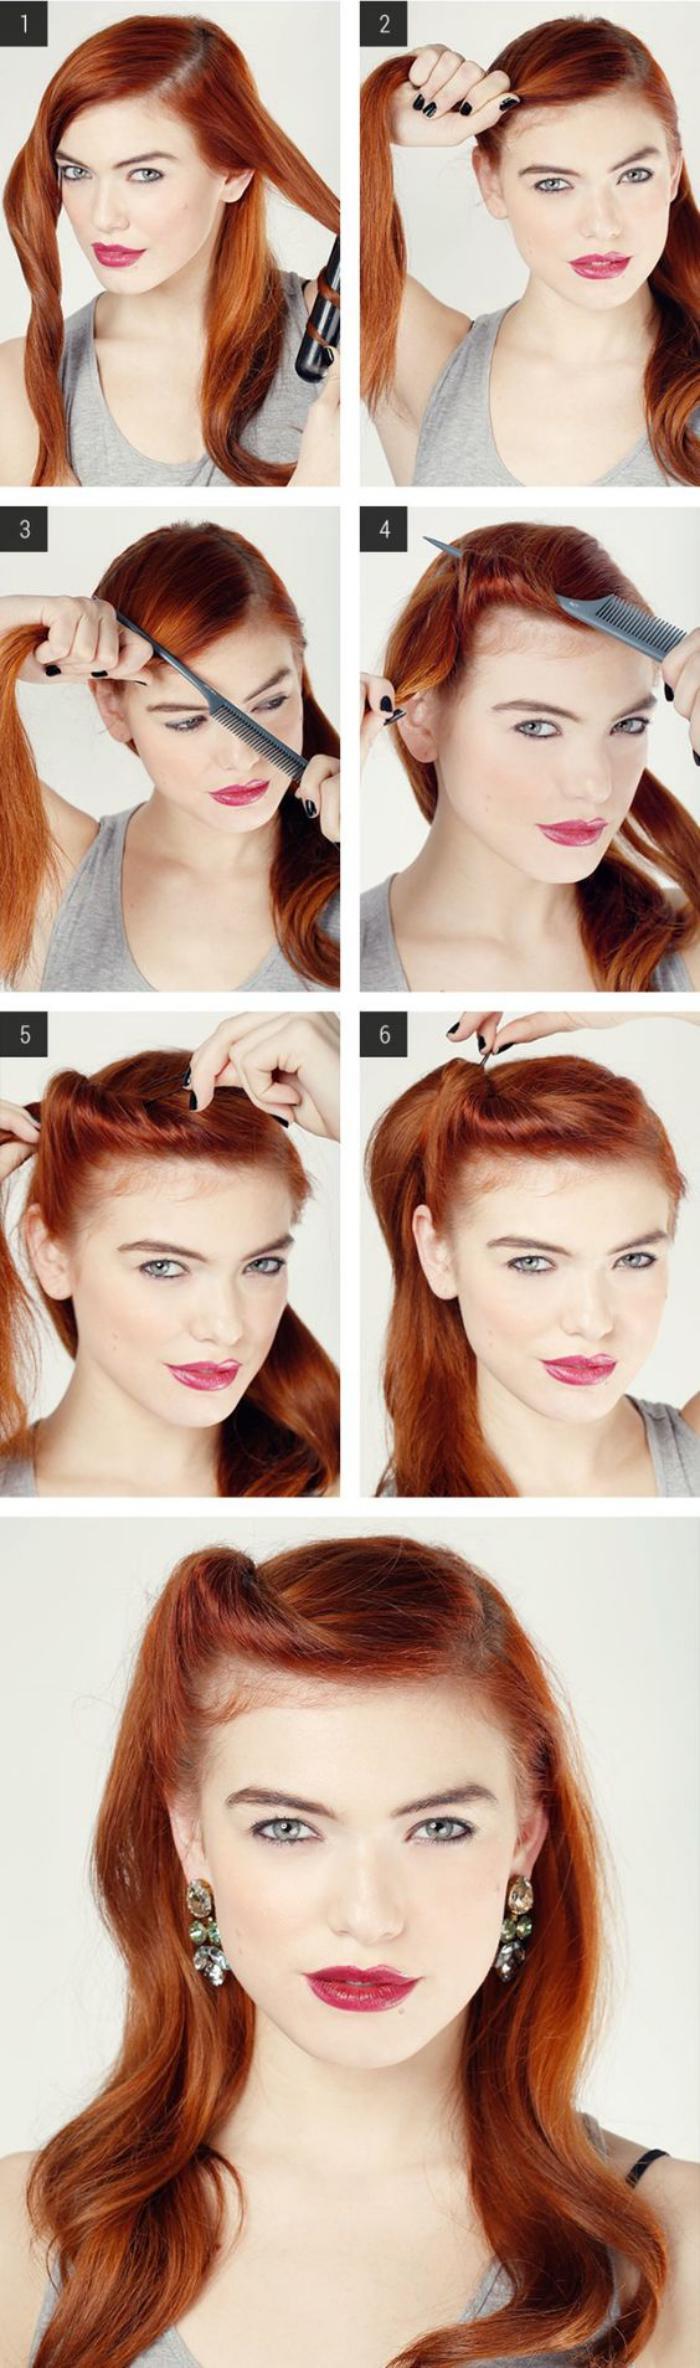 coiffure,pin,up,savoir,faire,coiffure,vintage